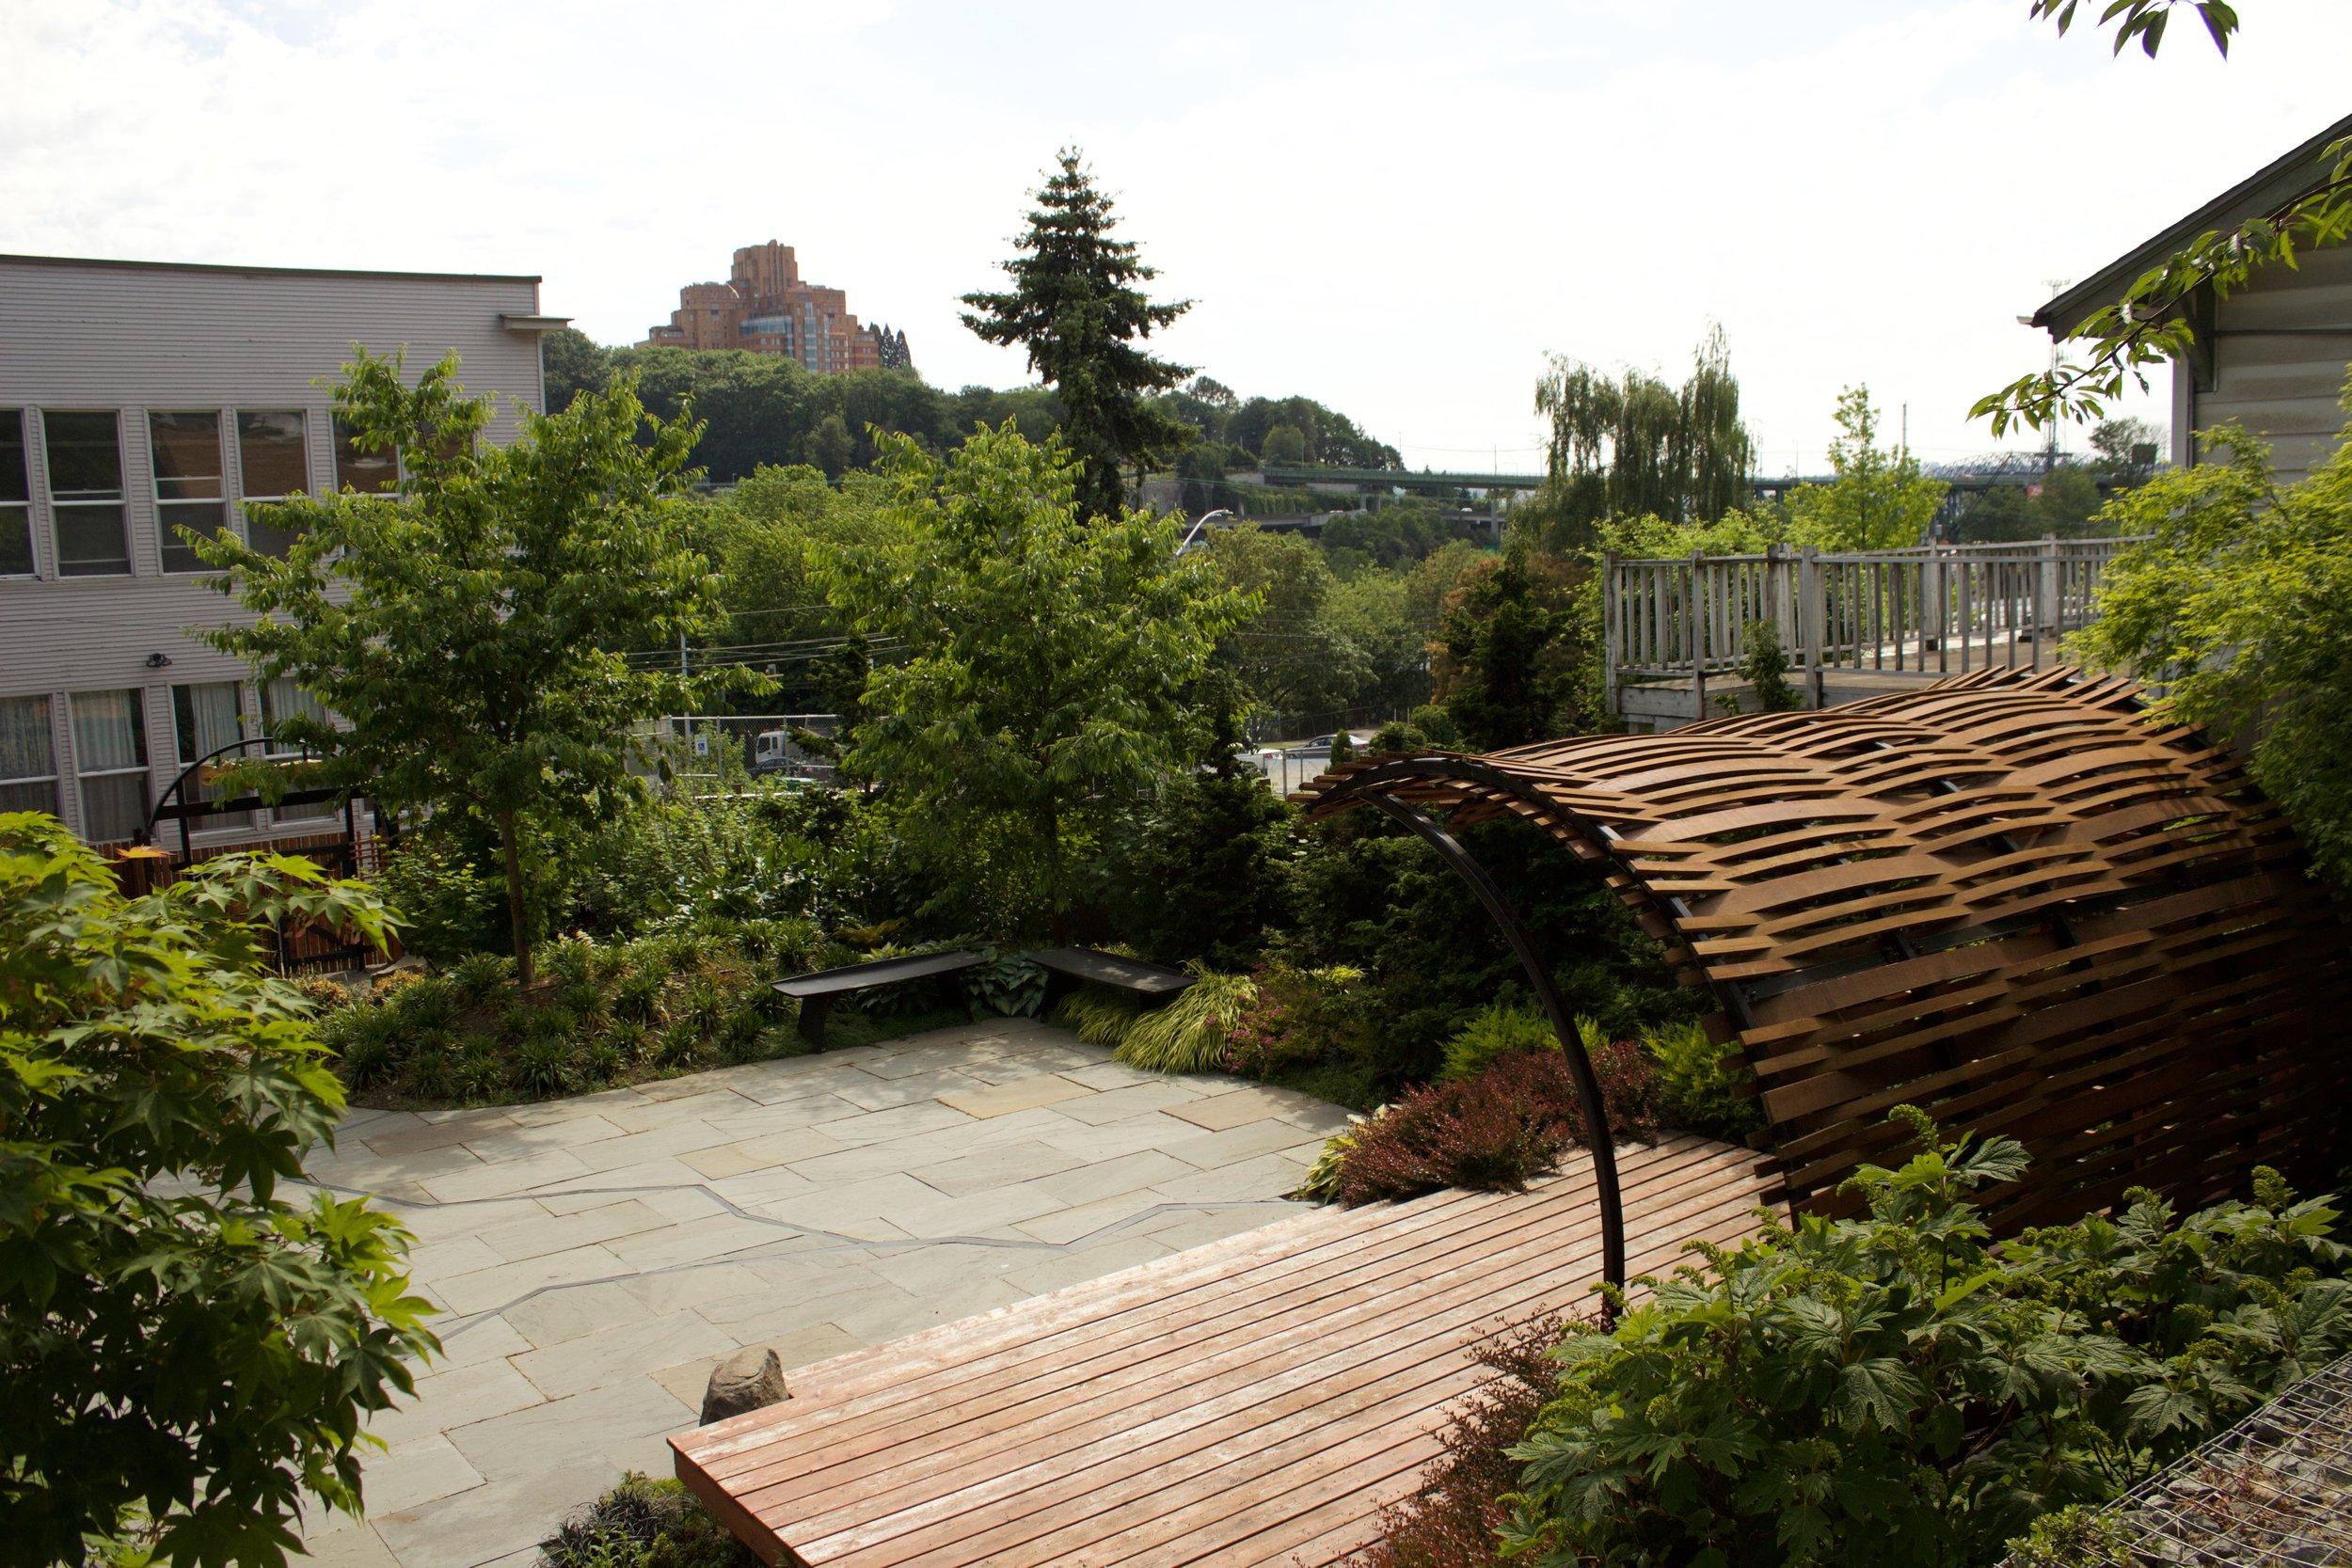 jcccw-seattle-japanese-rental-facility-2.jpg